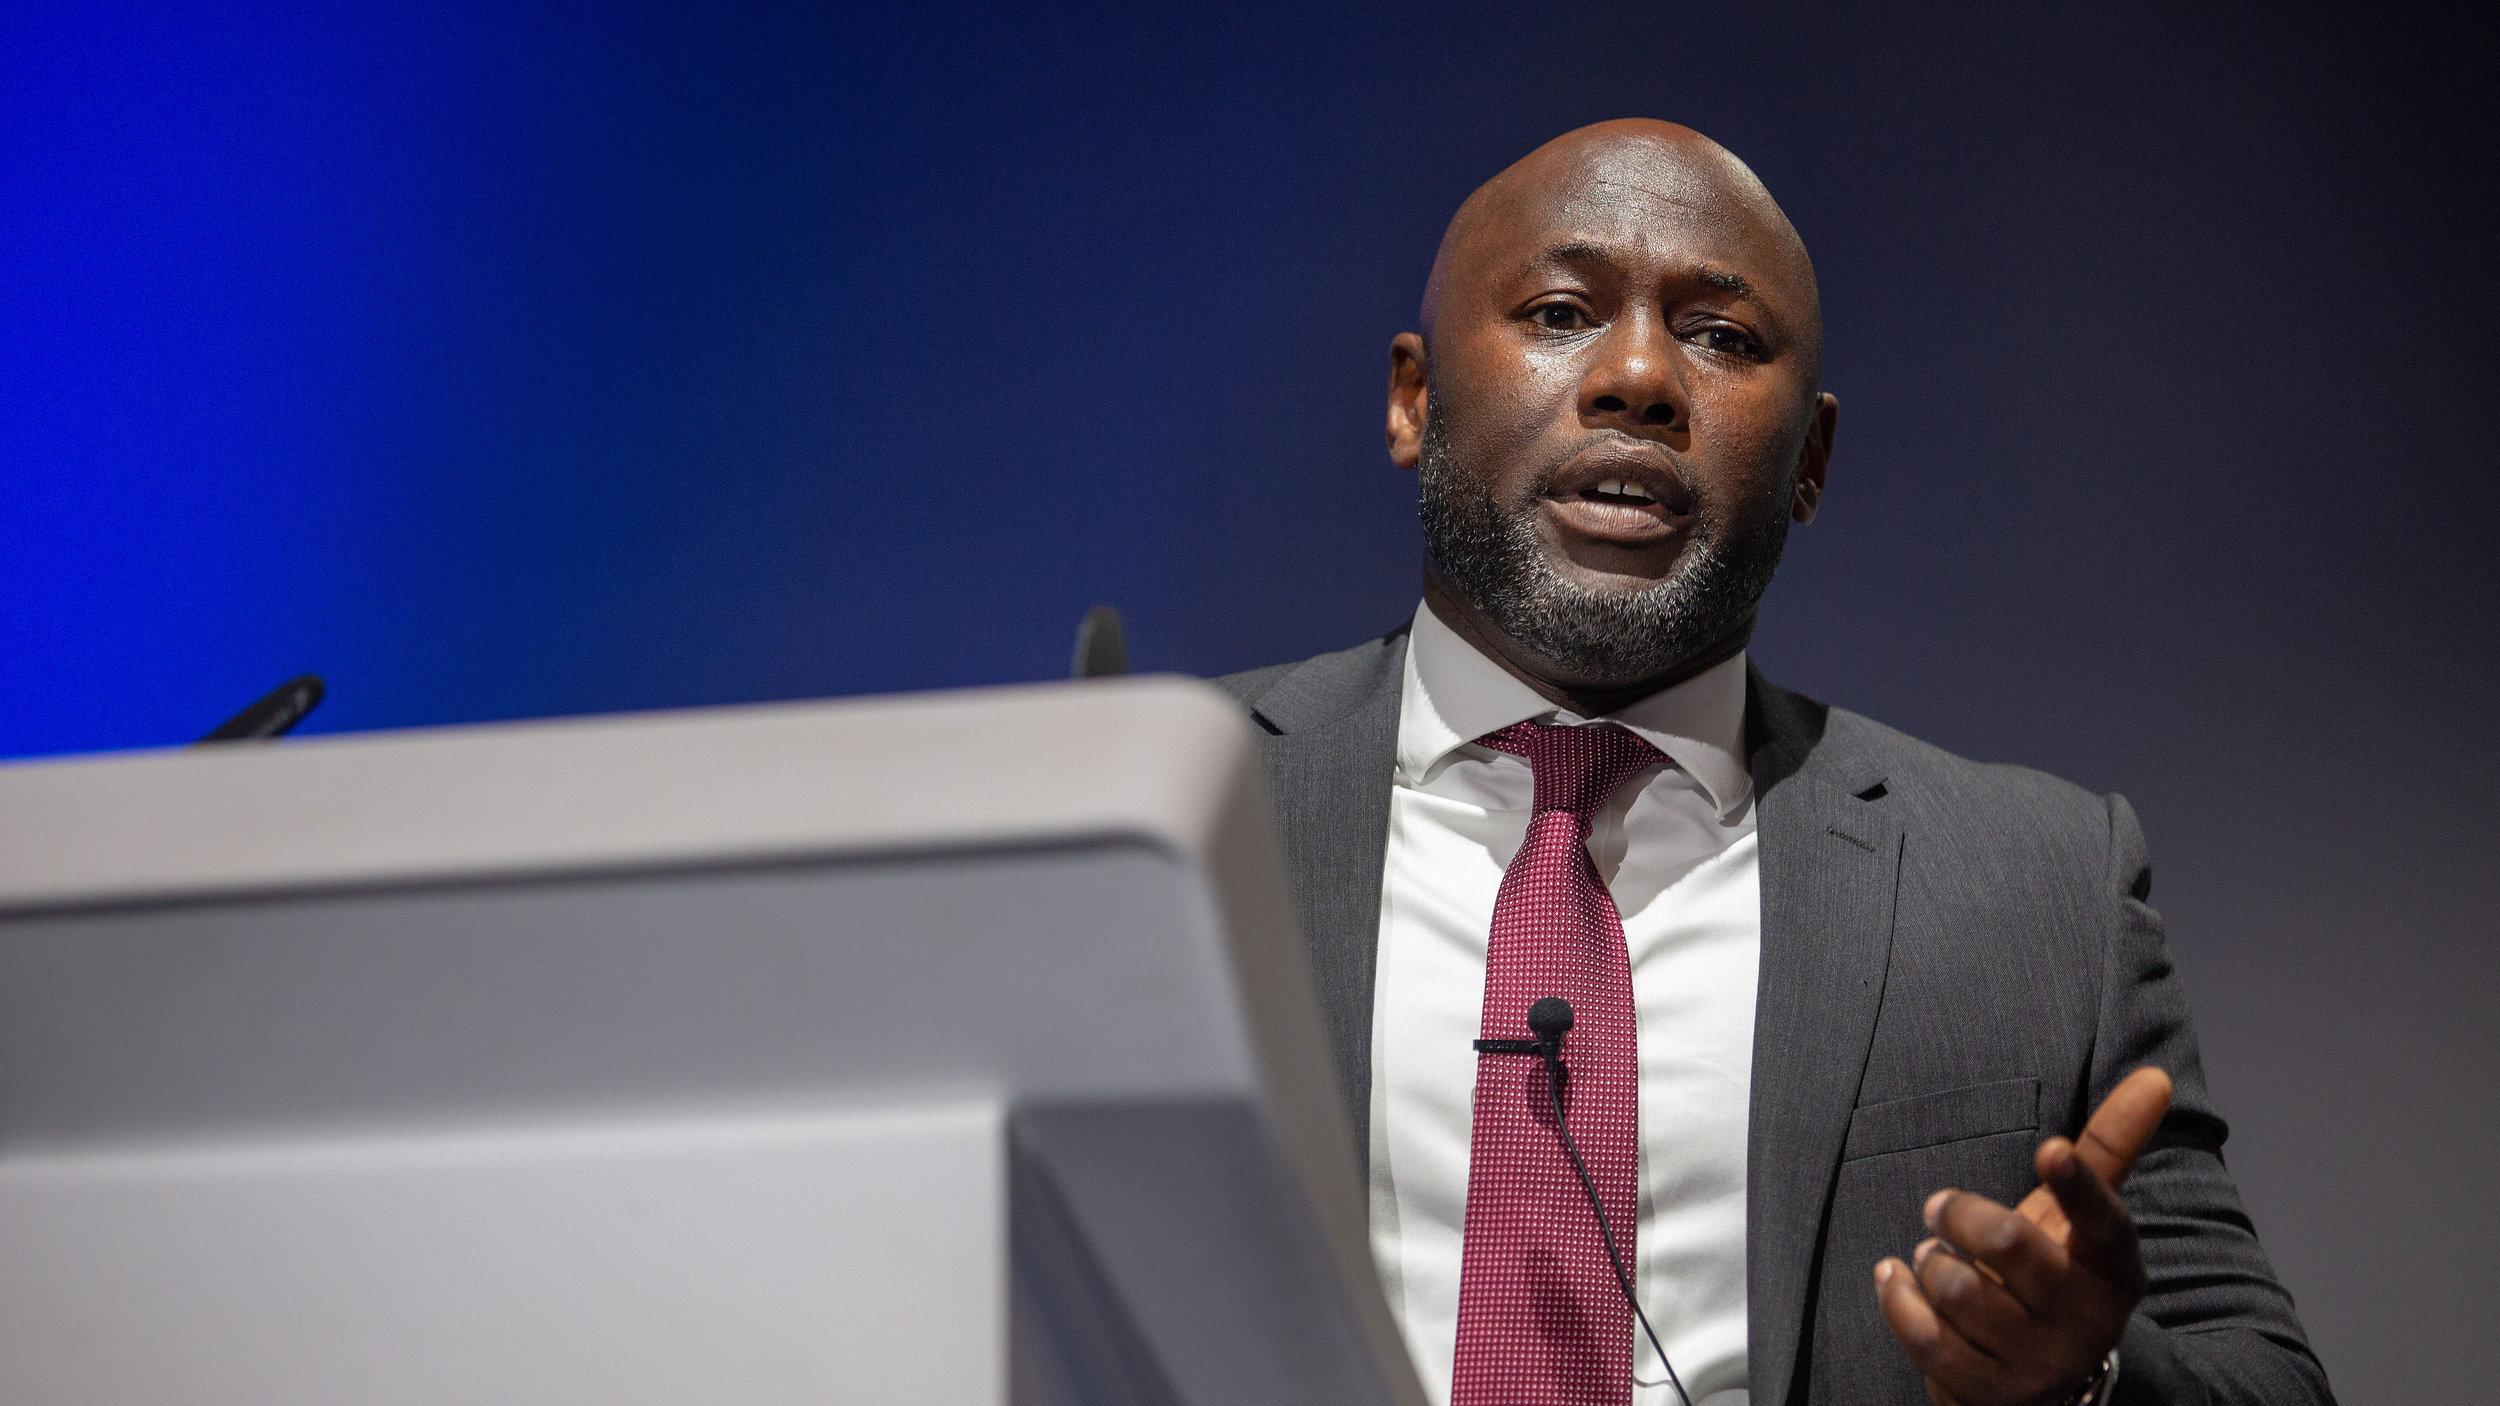 Ken Osivwemu. BarclaysBlack History Month 2018The Black Professional ForumOne Churchill Place2/10/18